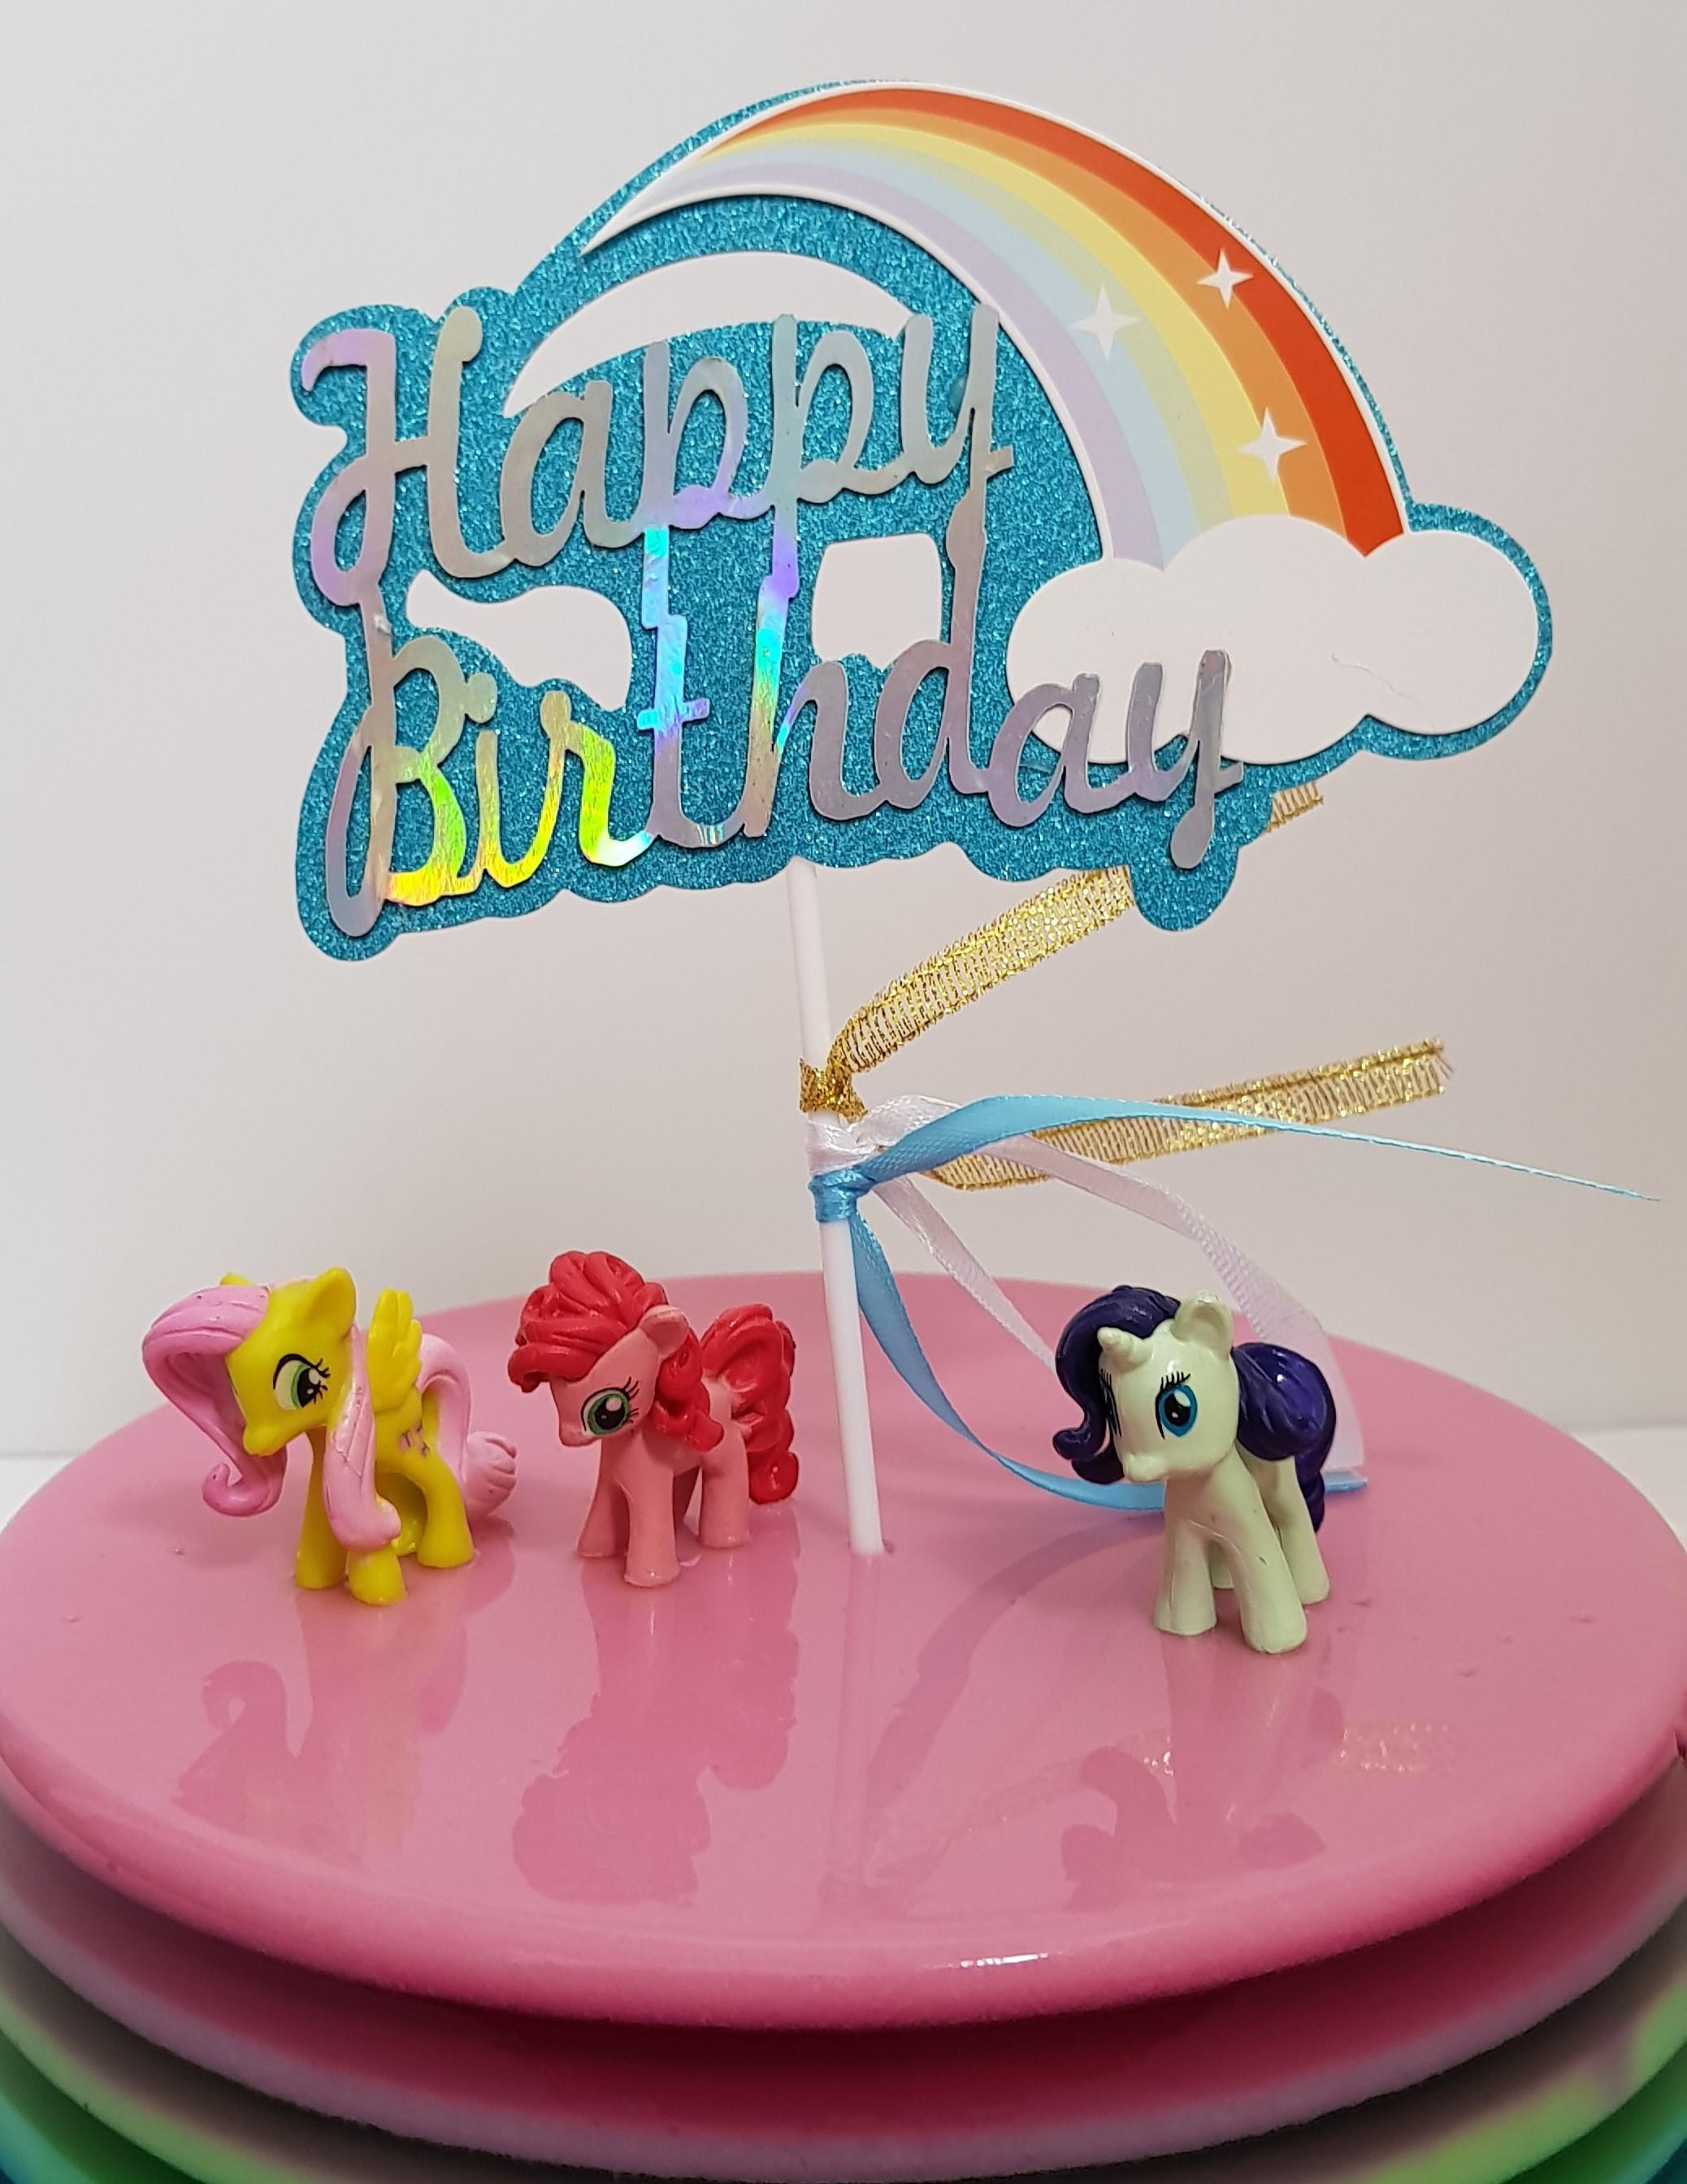 Actual Size Prev Next Birthday Cake Decoration